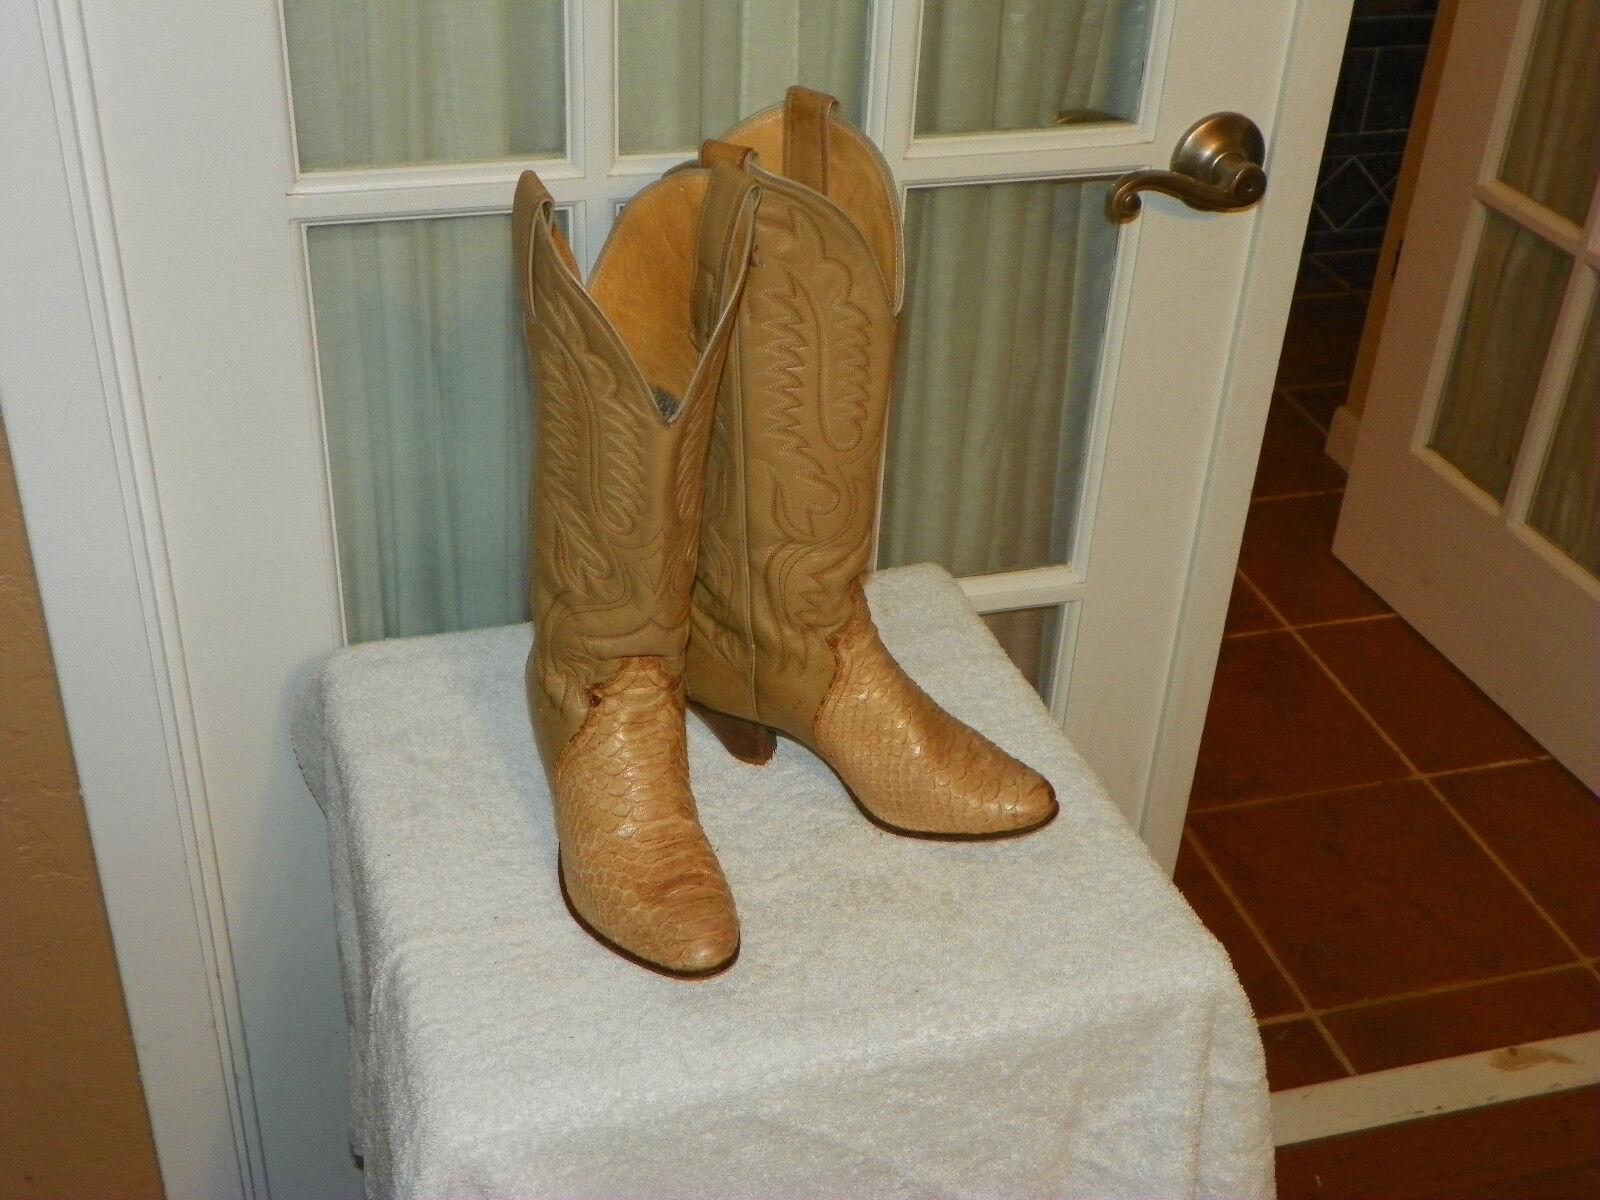 Justin L4438 Beige Snakeskin & Leather Cowboy Western Boots Women's size 5 B USA